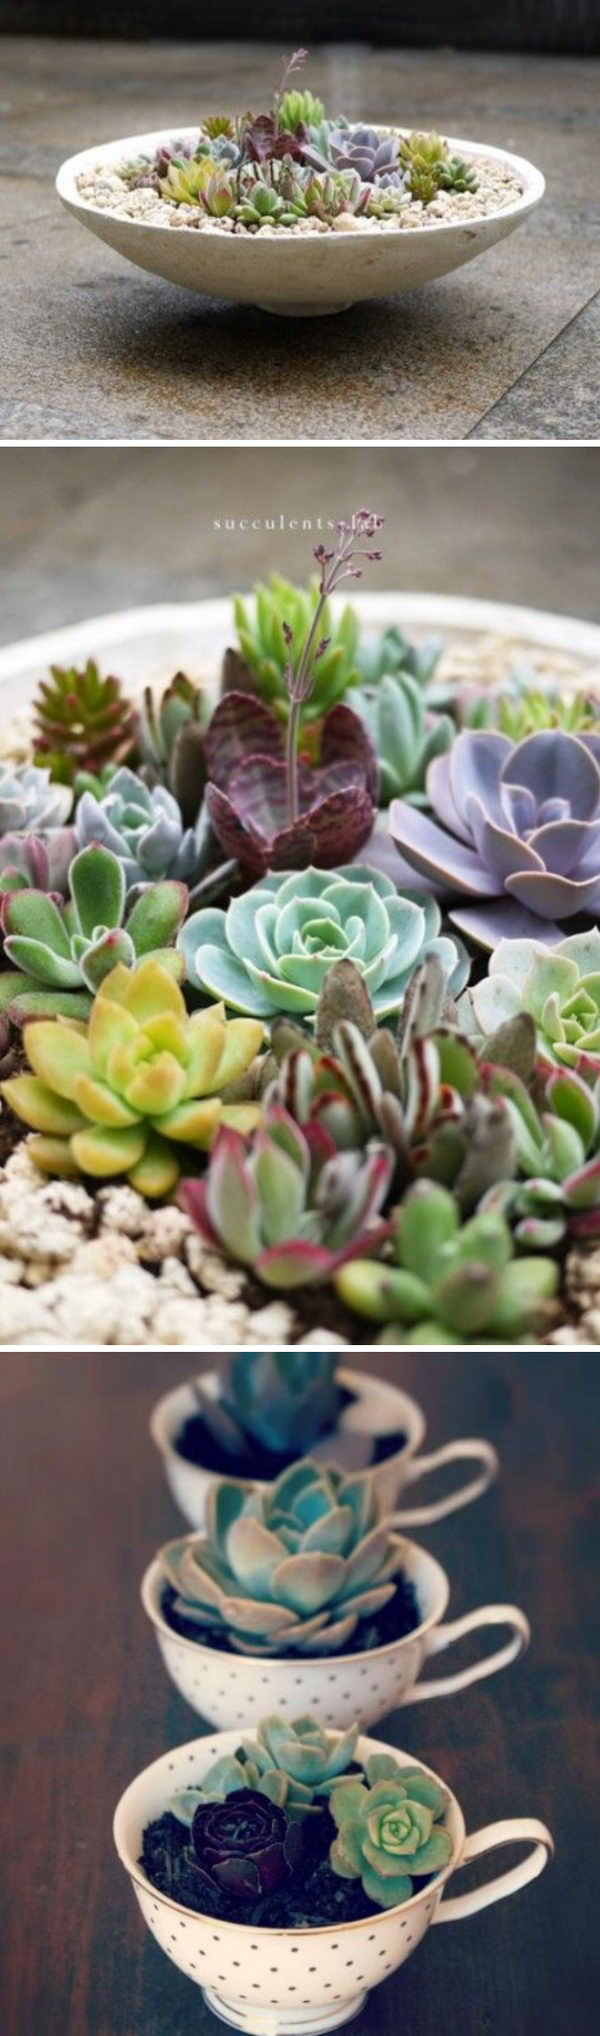 DIY Teacup Succulent Garden.